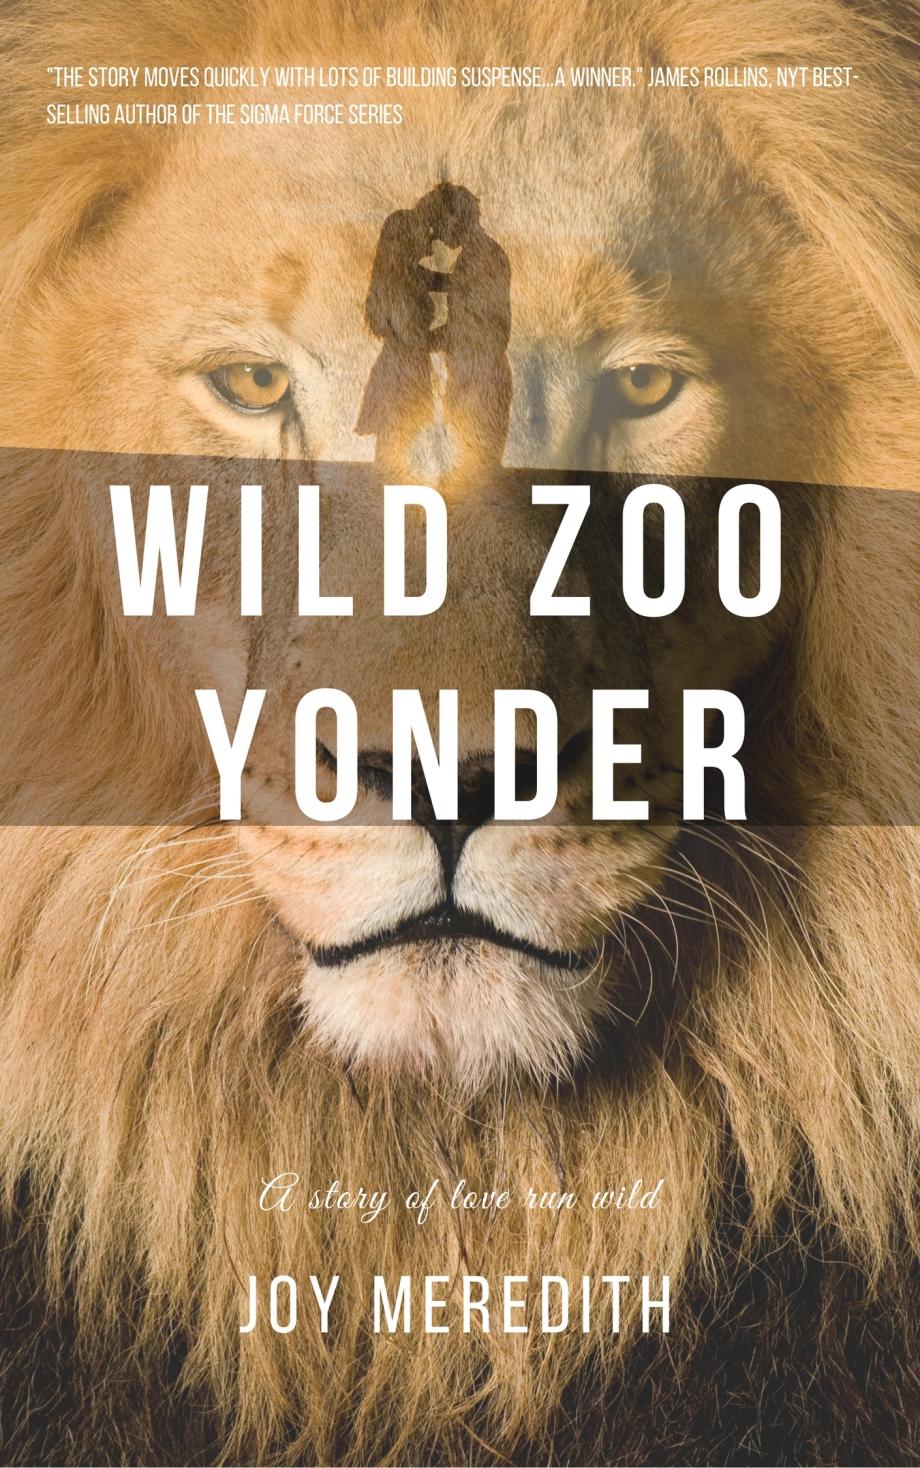 WildZooYondercover